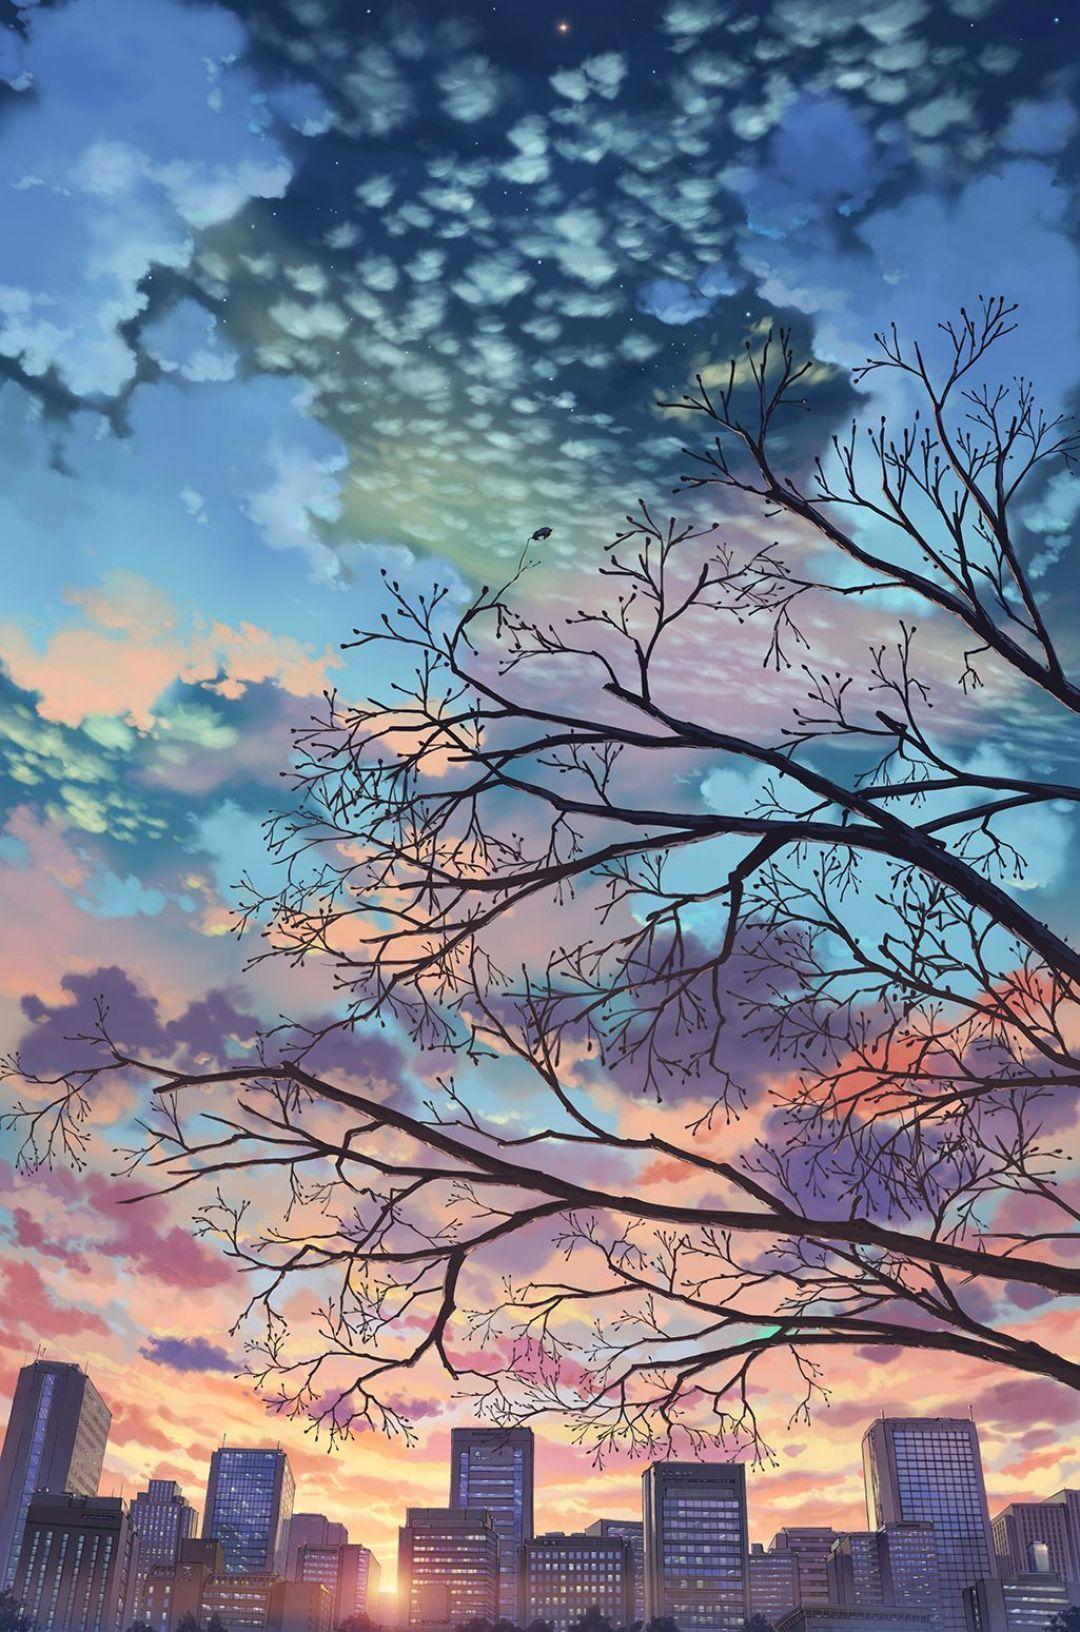 Anime Aesthetic 4k Wallpapers Wallpaper Cave